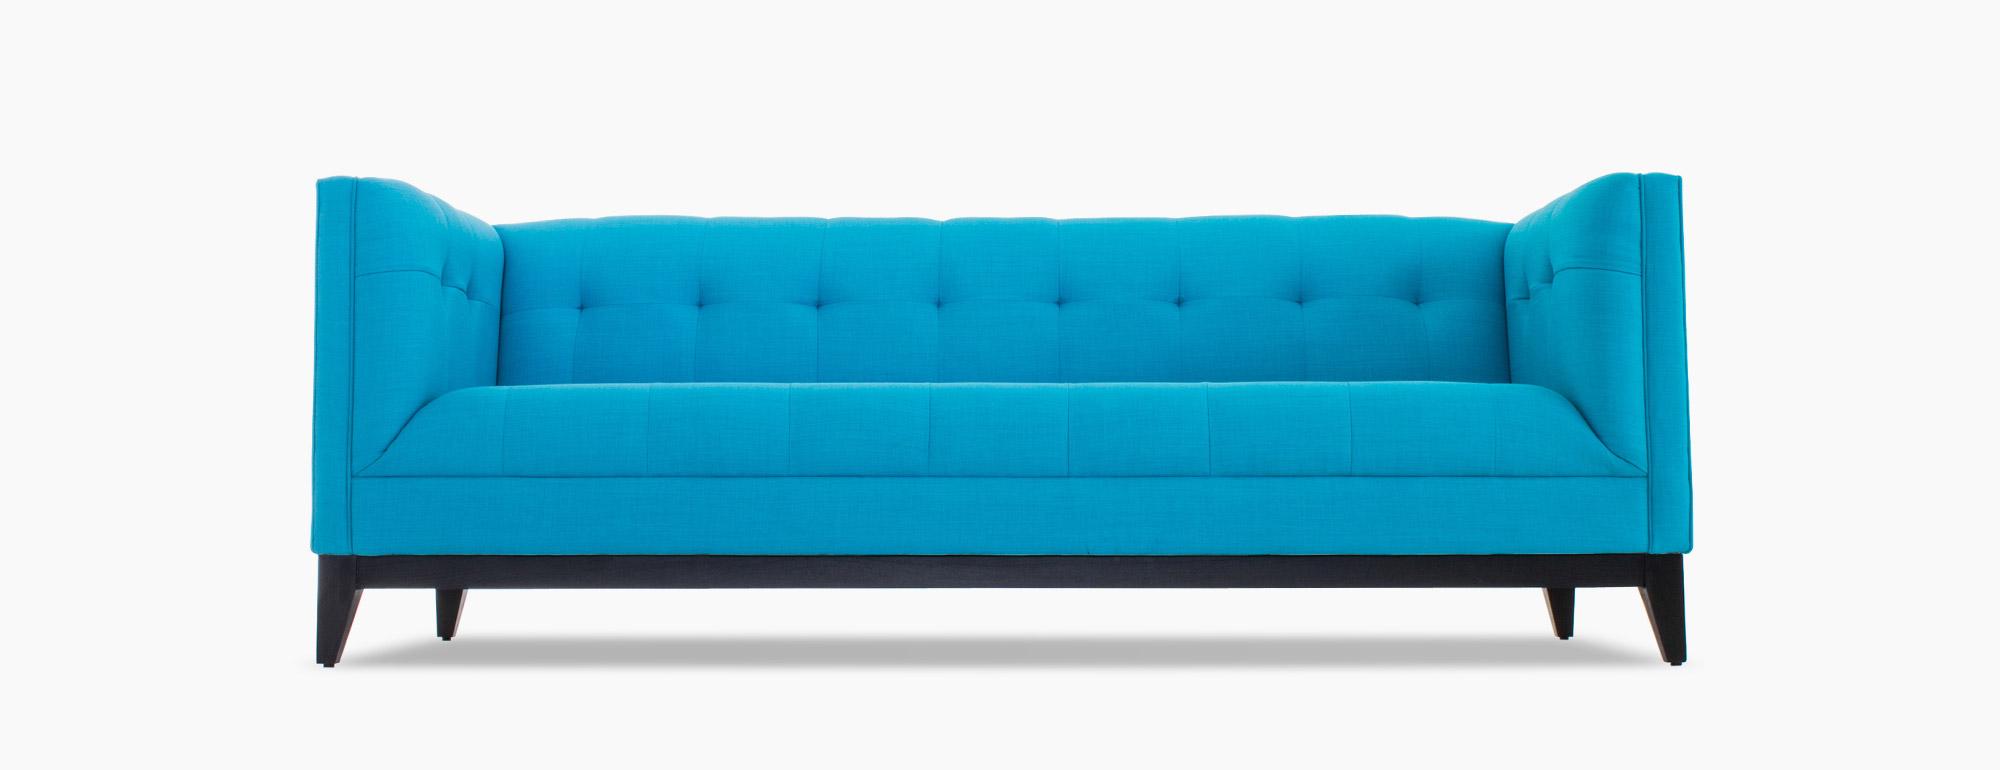 hero-stowe-sofa-1